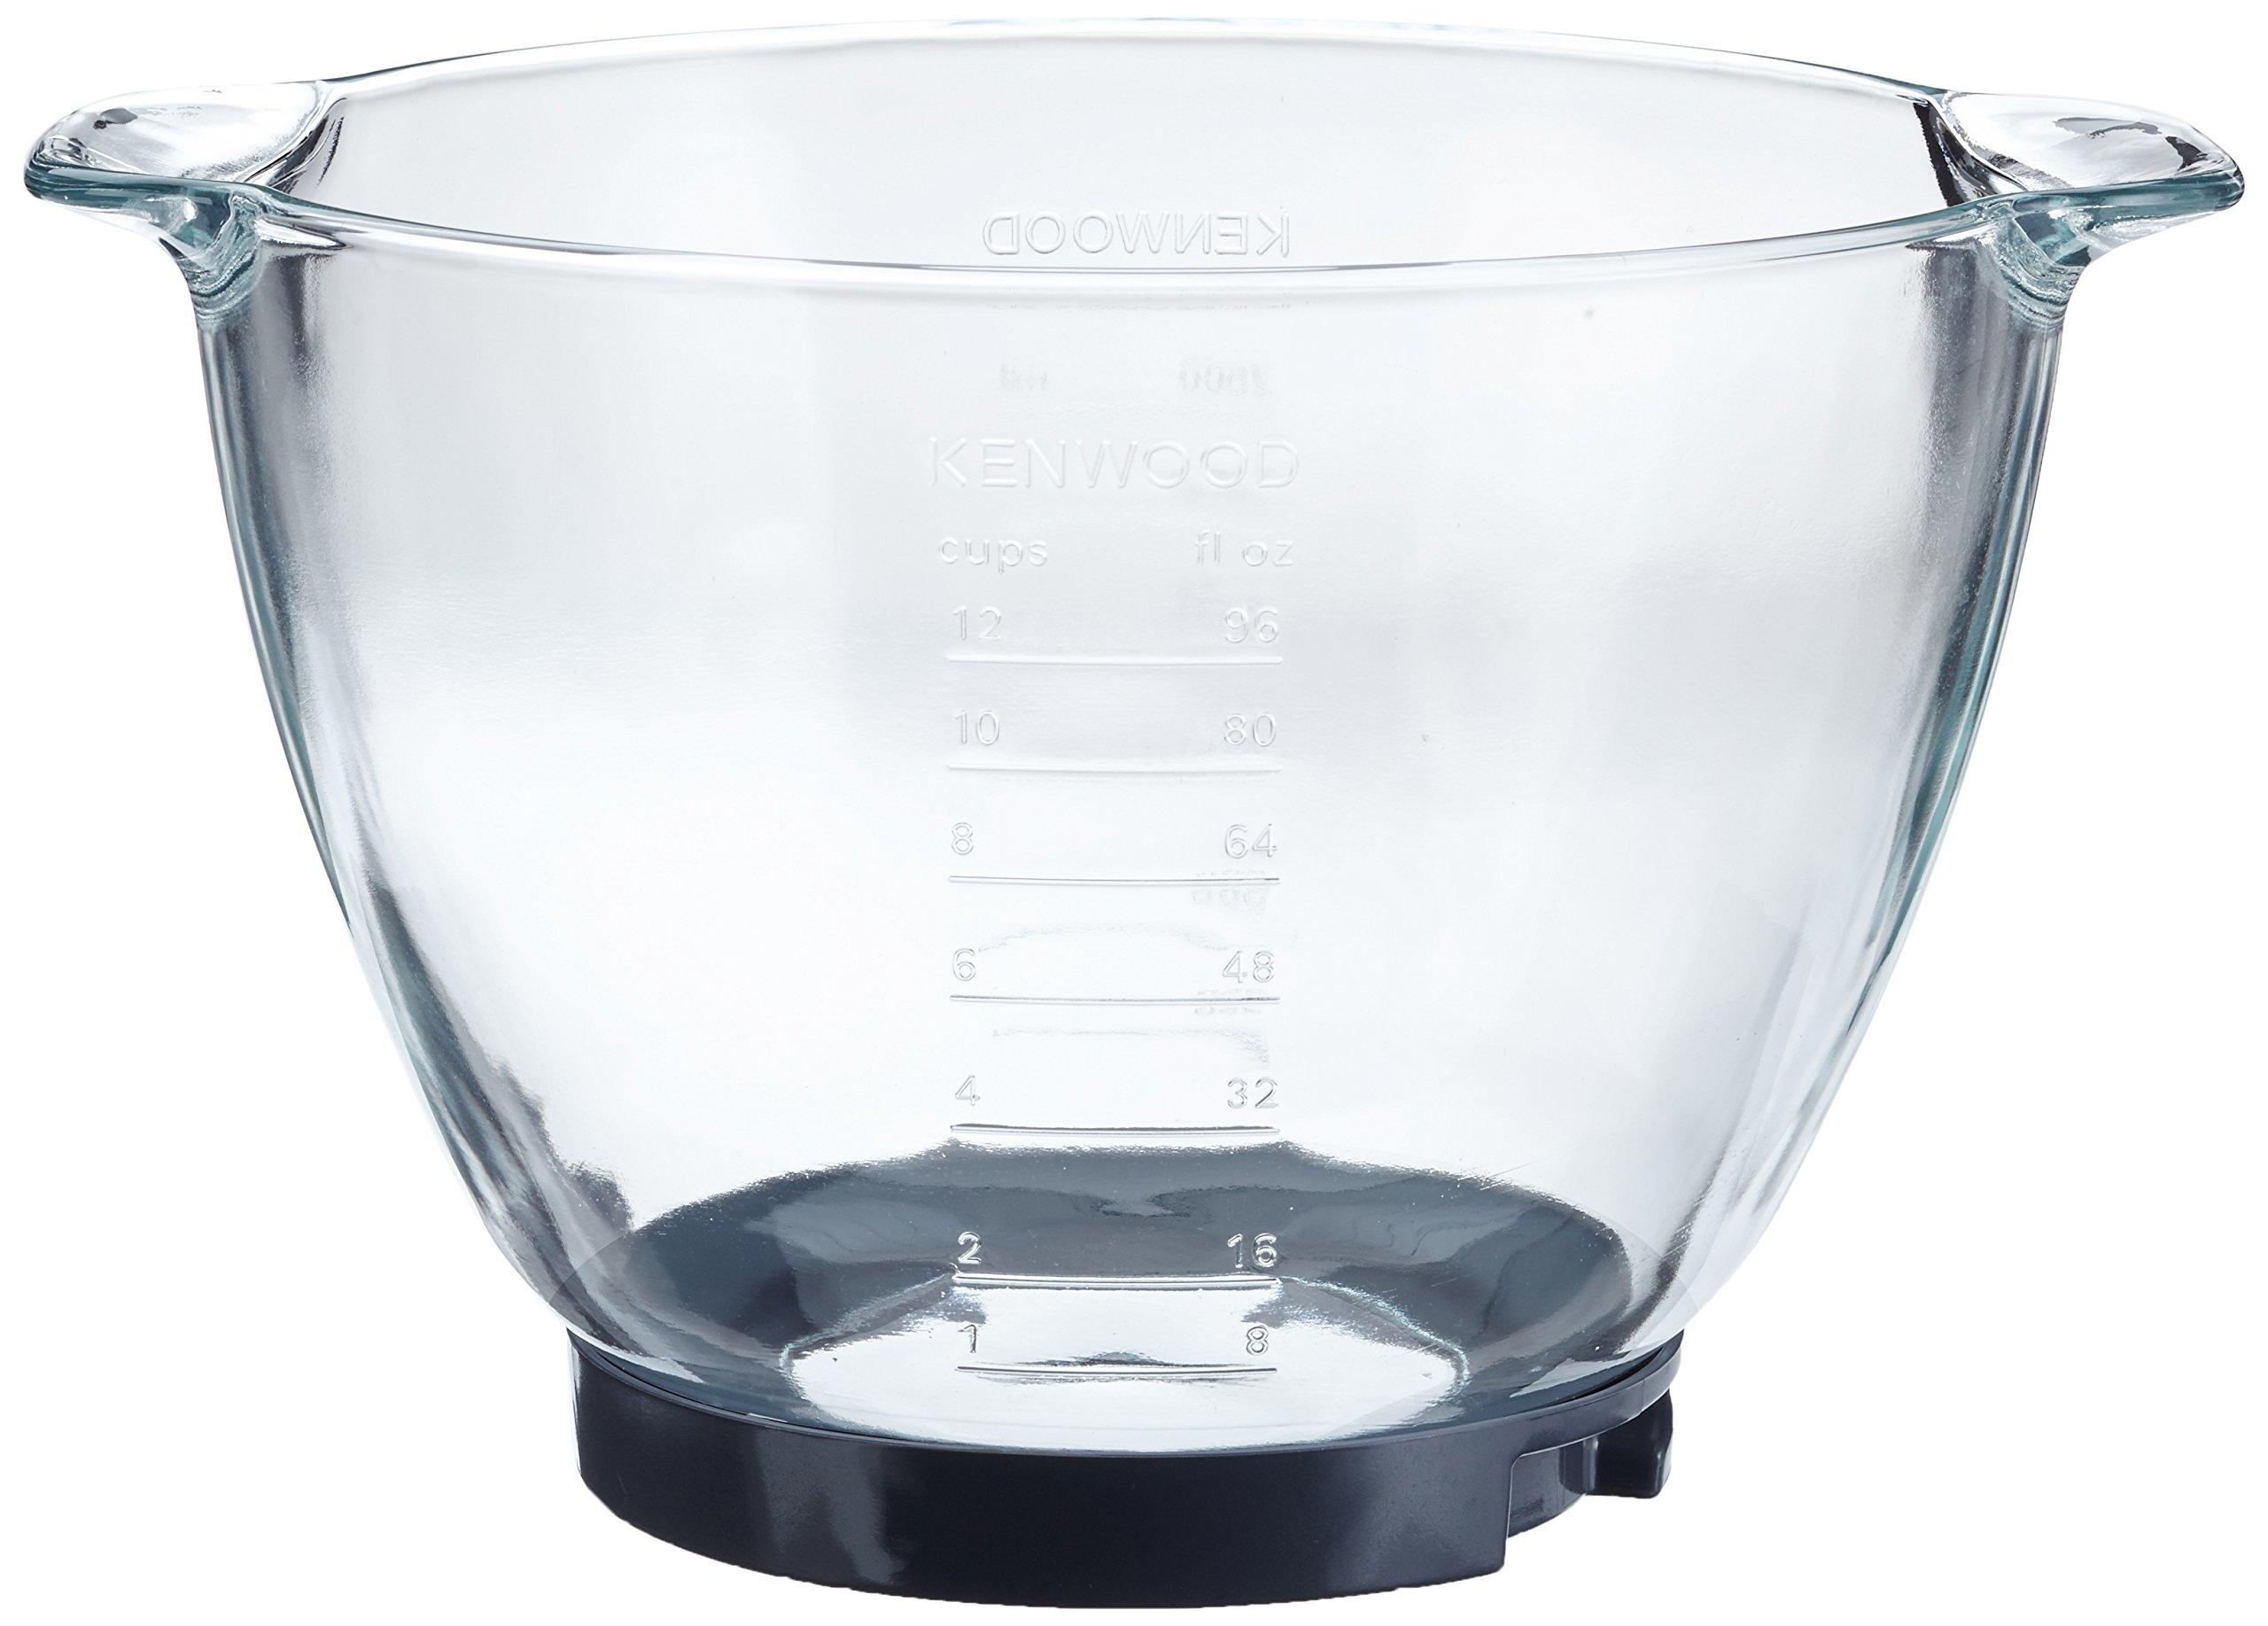 Kenwood Chef Glass Bowl - 4.6 Litre